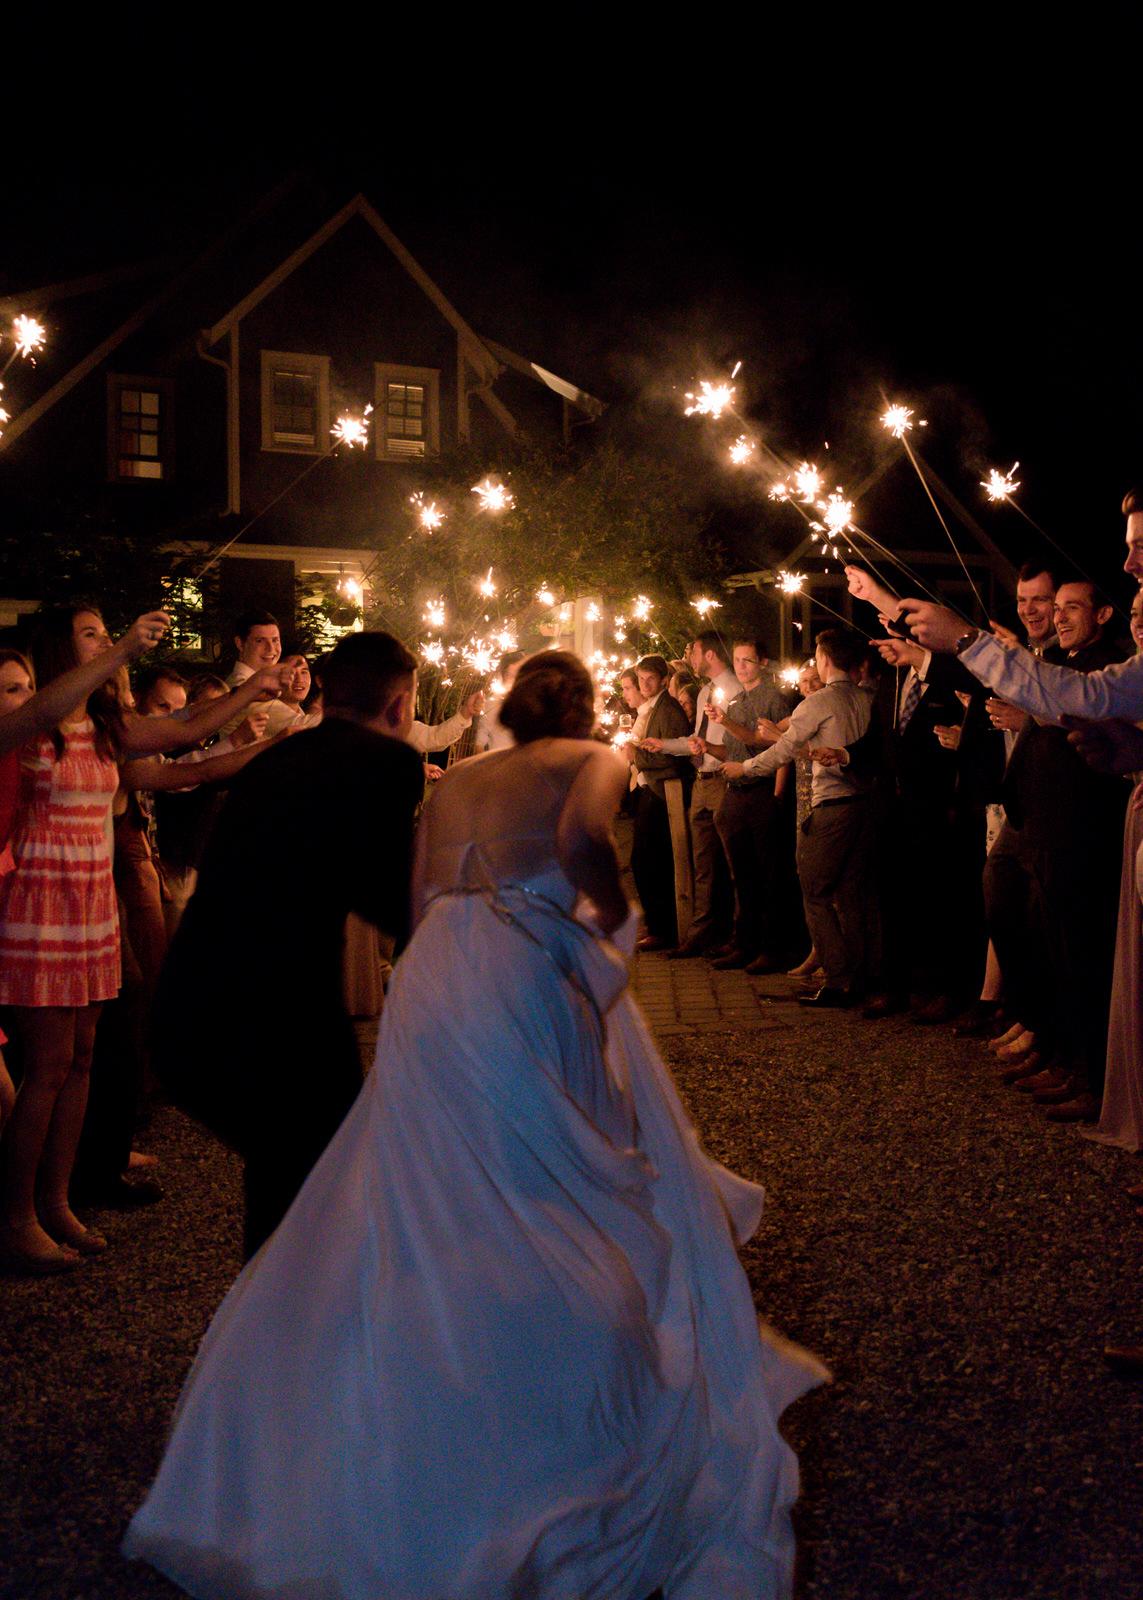 Bride Group Farewell Departure Sparklers Wedding Woodinville Bellevue Dress Theory-1.jpg